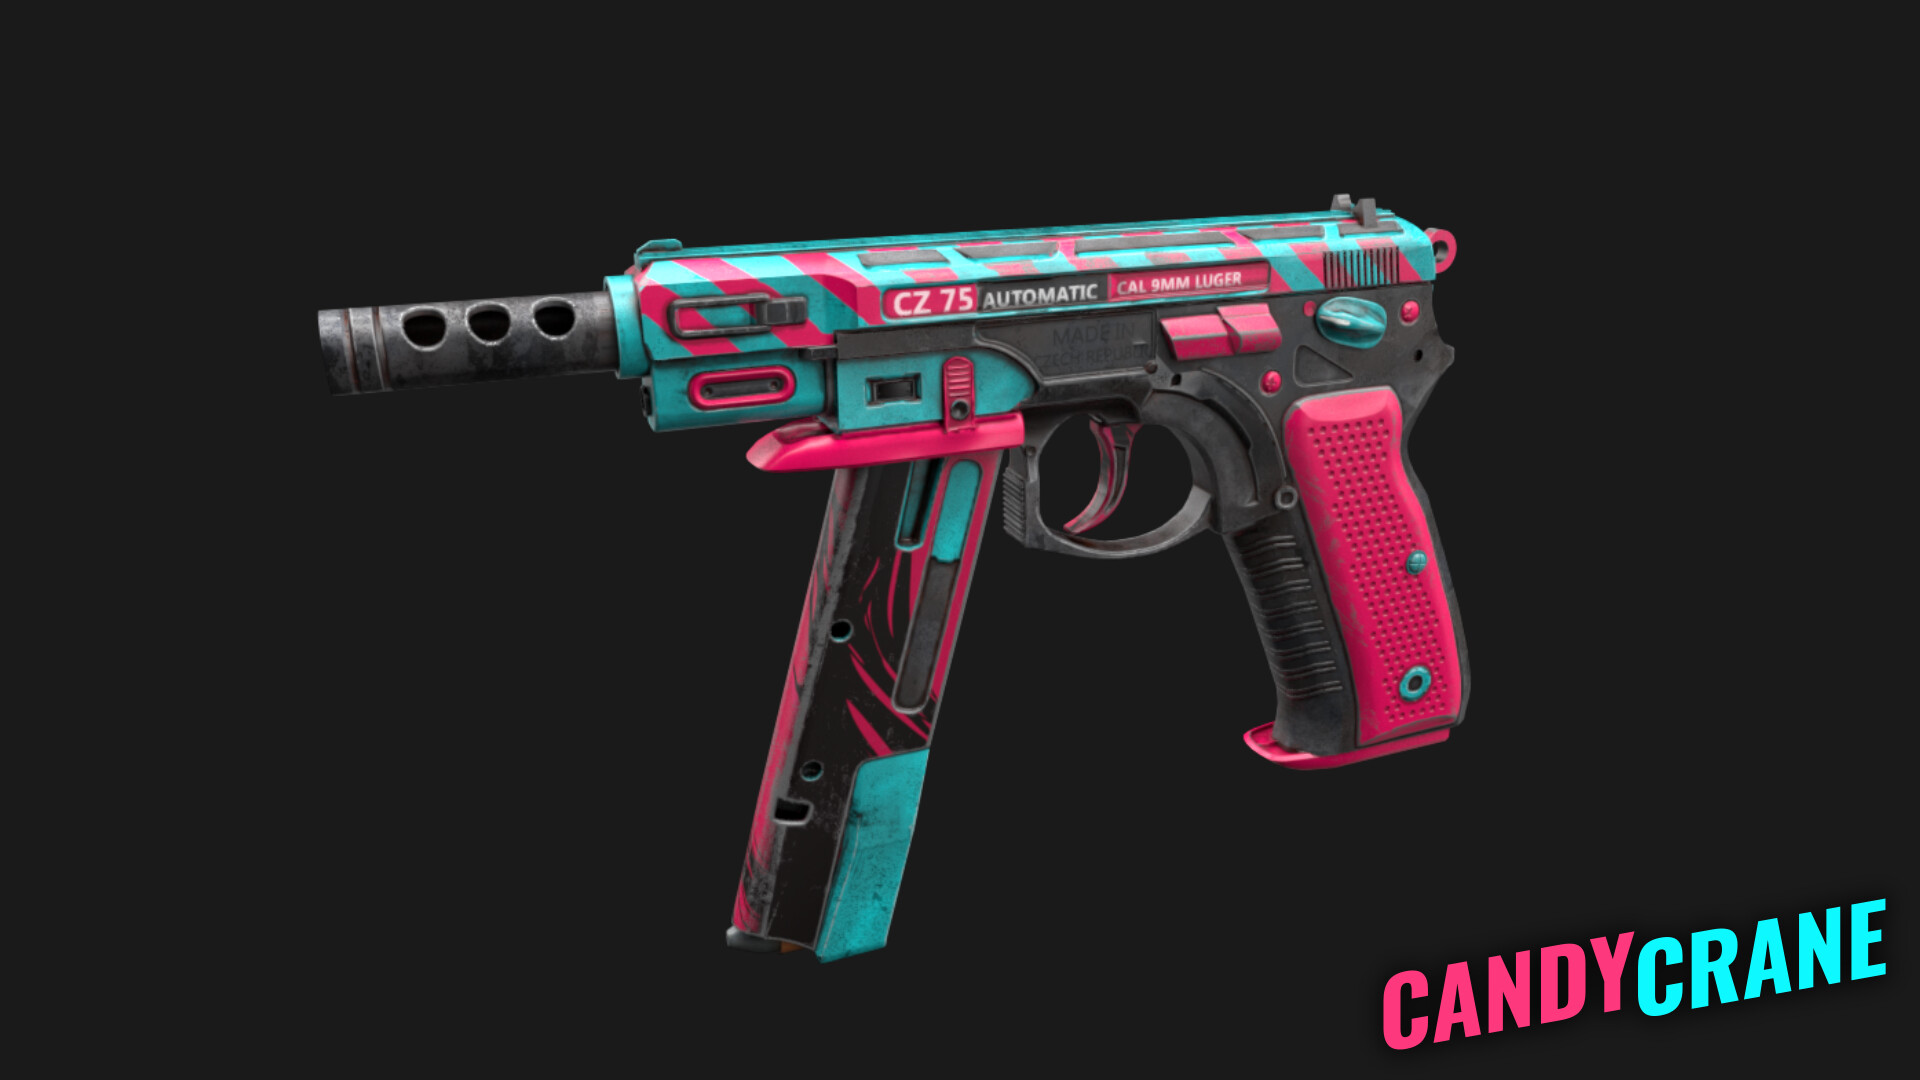 ArtStation - CZ-75 Candy Crane - CS:GO Skin, Victor Hugo Borges